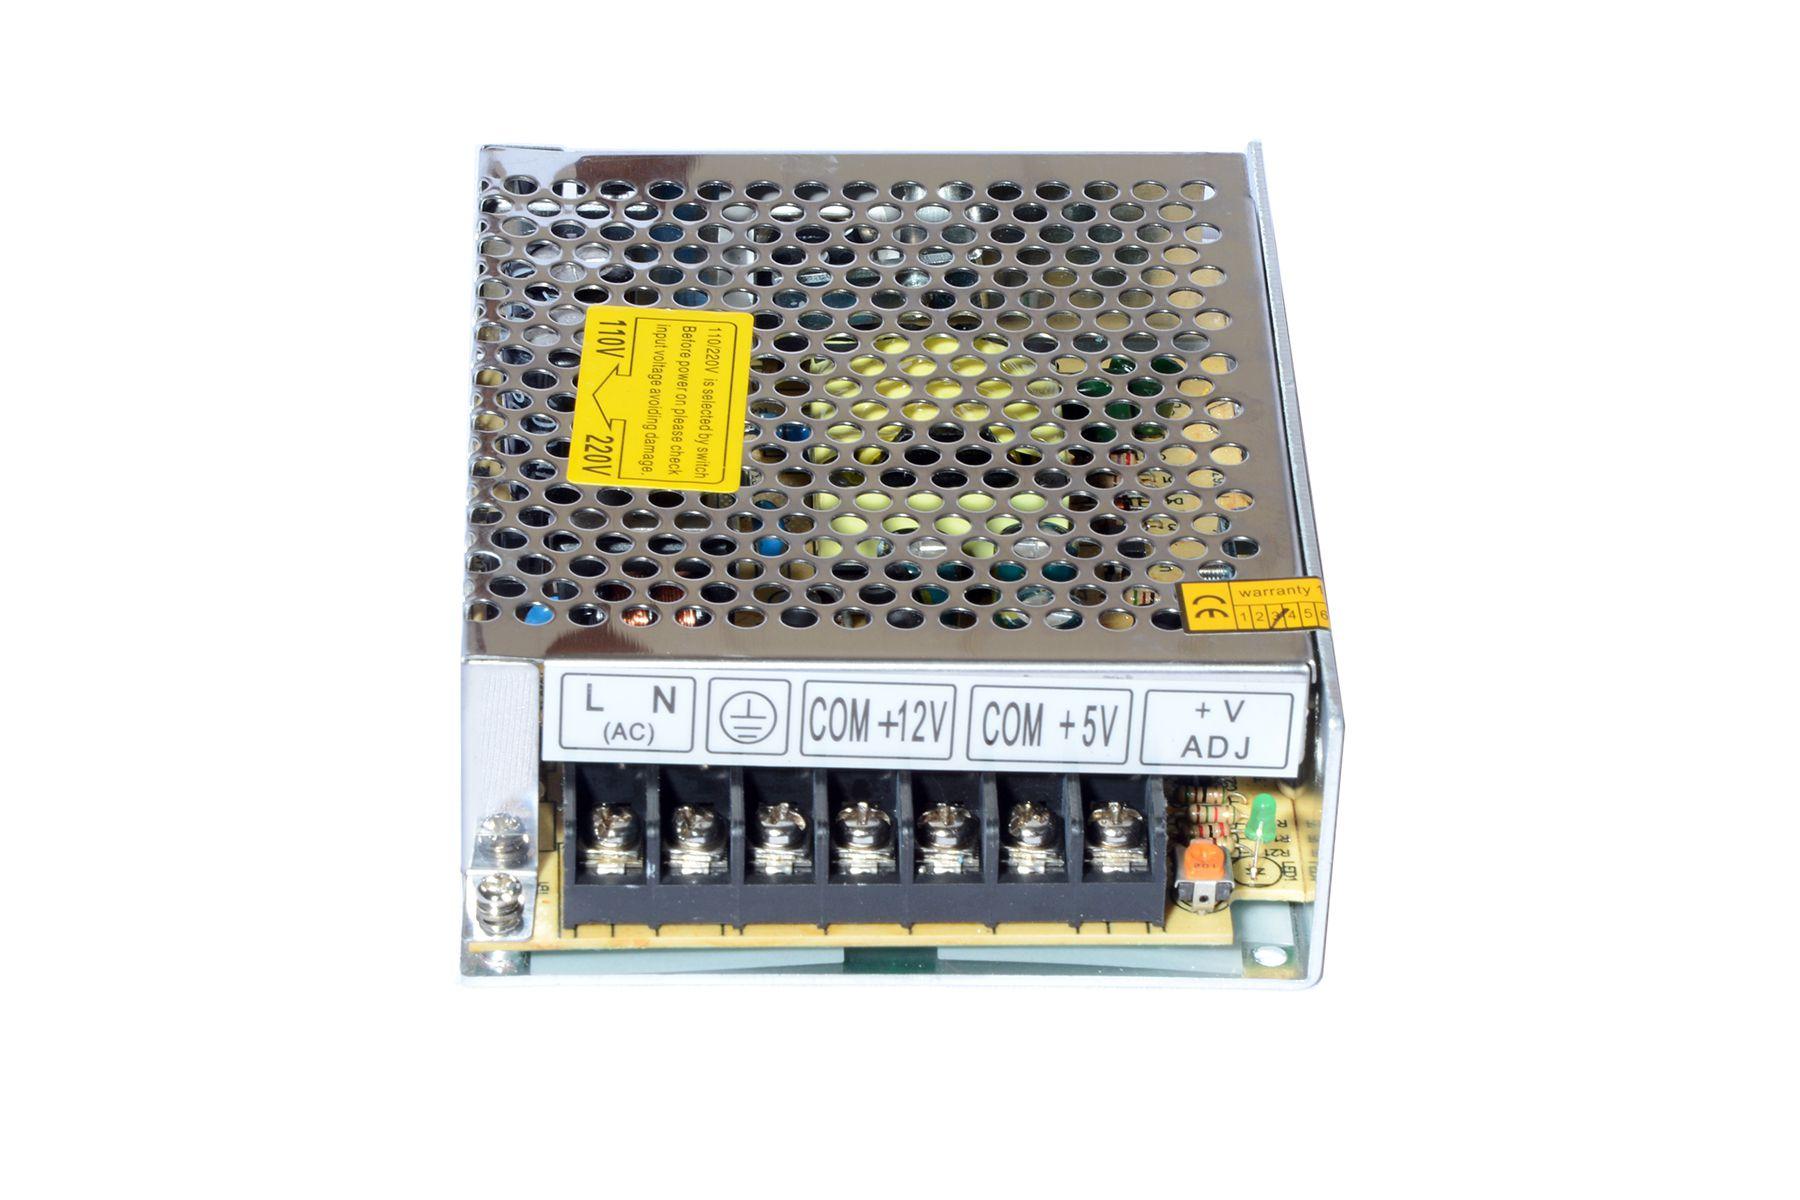 Maa Ku 12V/1A & 5v/4A dual output voltage SMPS & Power Supply - Buy ...